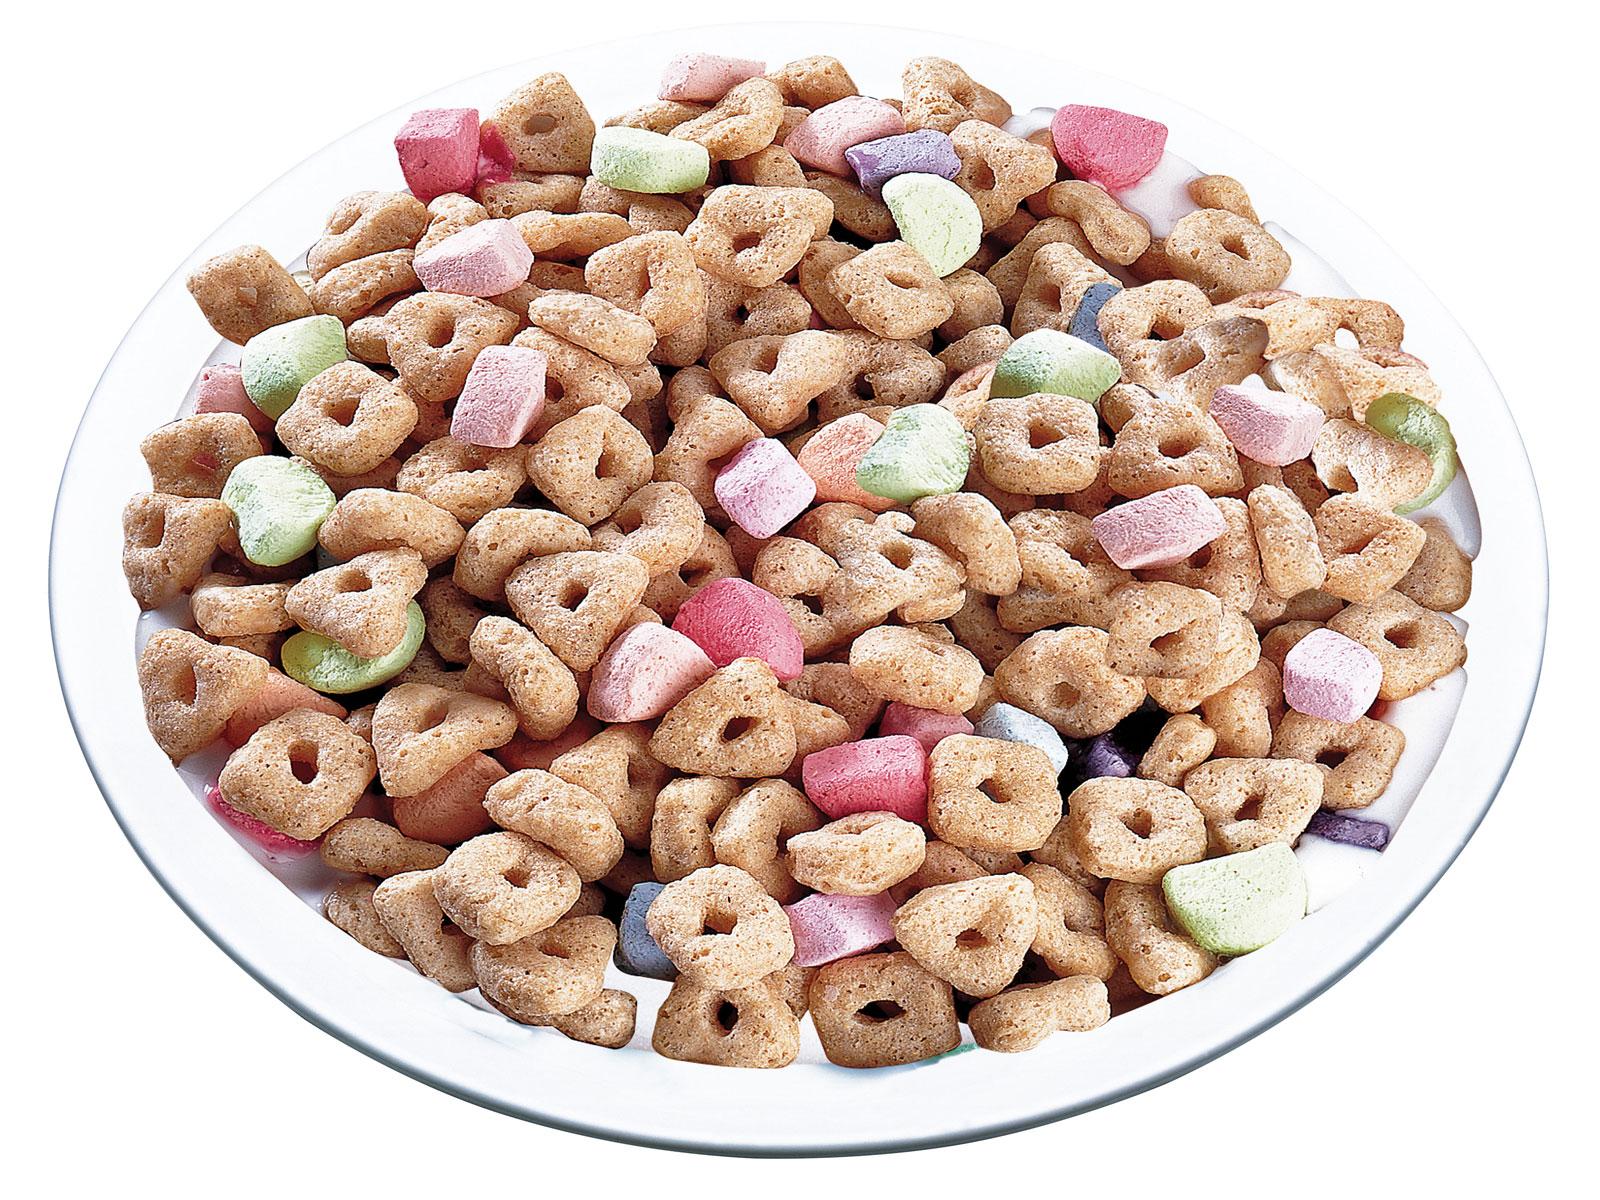 Bob Ross cereal